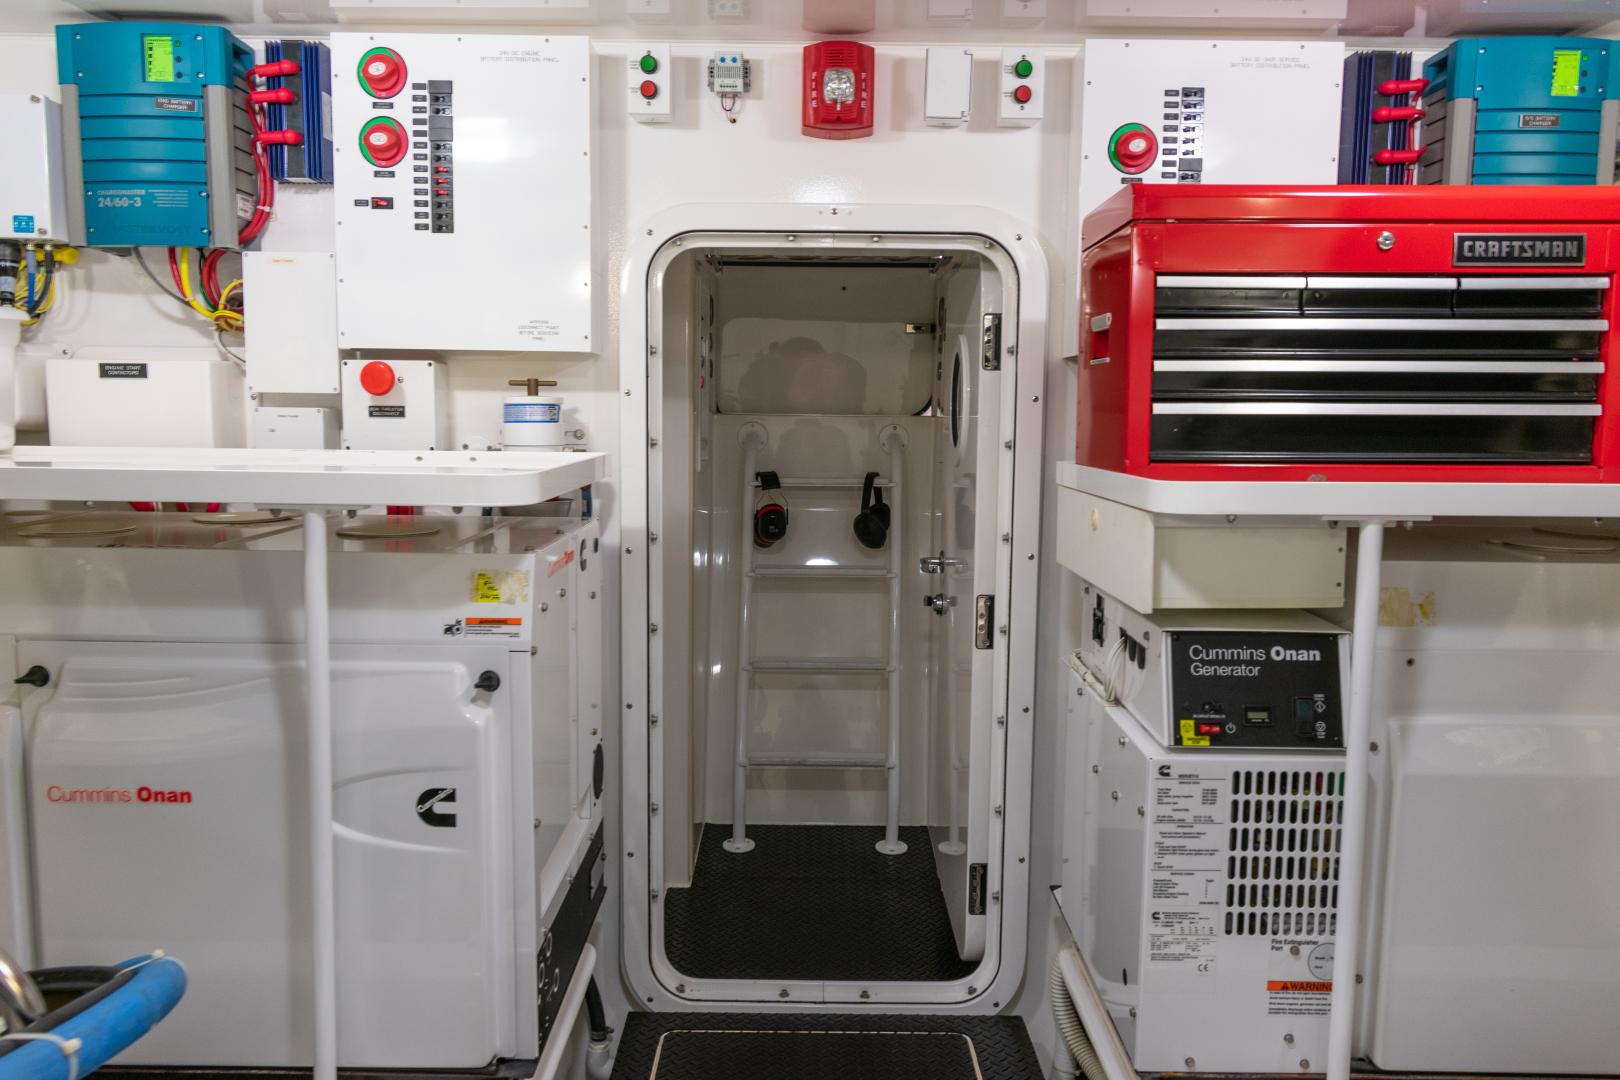 Viking-70 Convertible 2014-Load N Go Port Aransas-Texas-United States-2014 70 Viking Load N Go Engine Room (1)-1380533 | Thumbnail